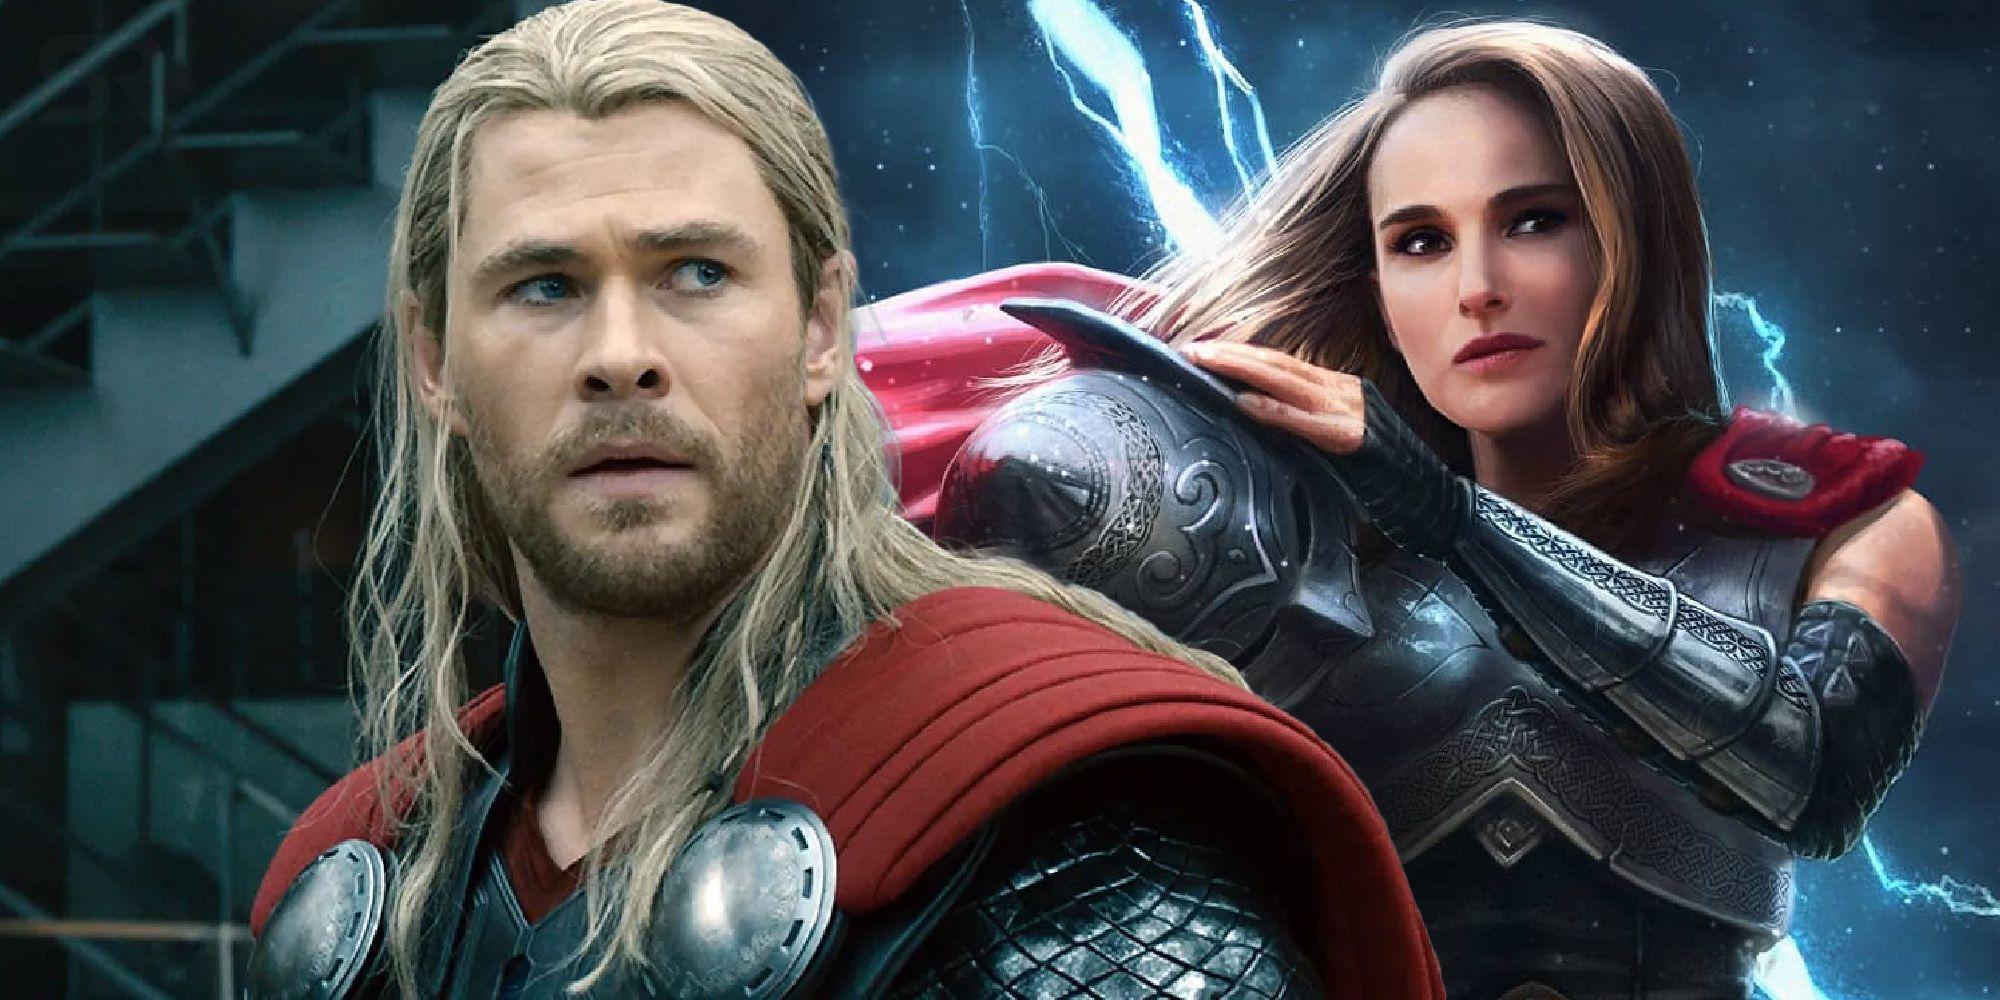 Love Thunder How Powerful Portman S Thor Will Be Compared To Hemsworth S Love and thunder as the villain gorr the god butcher. love thunder how powerful portman s